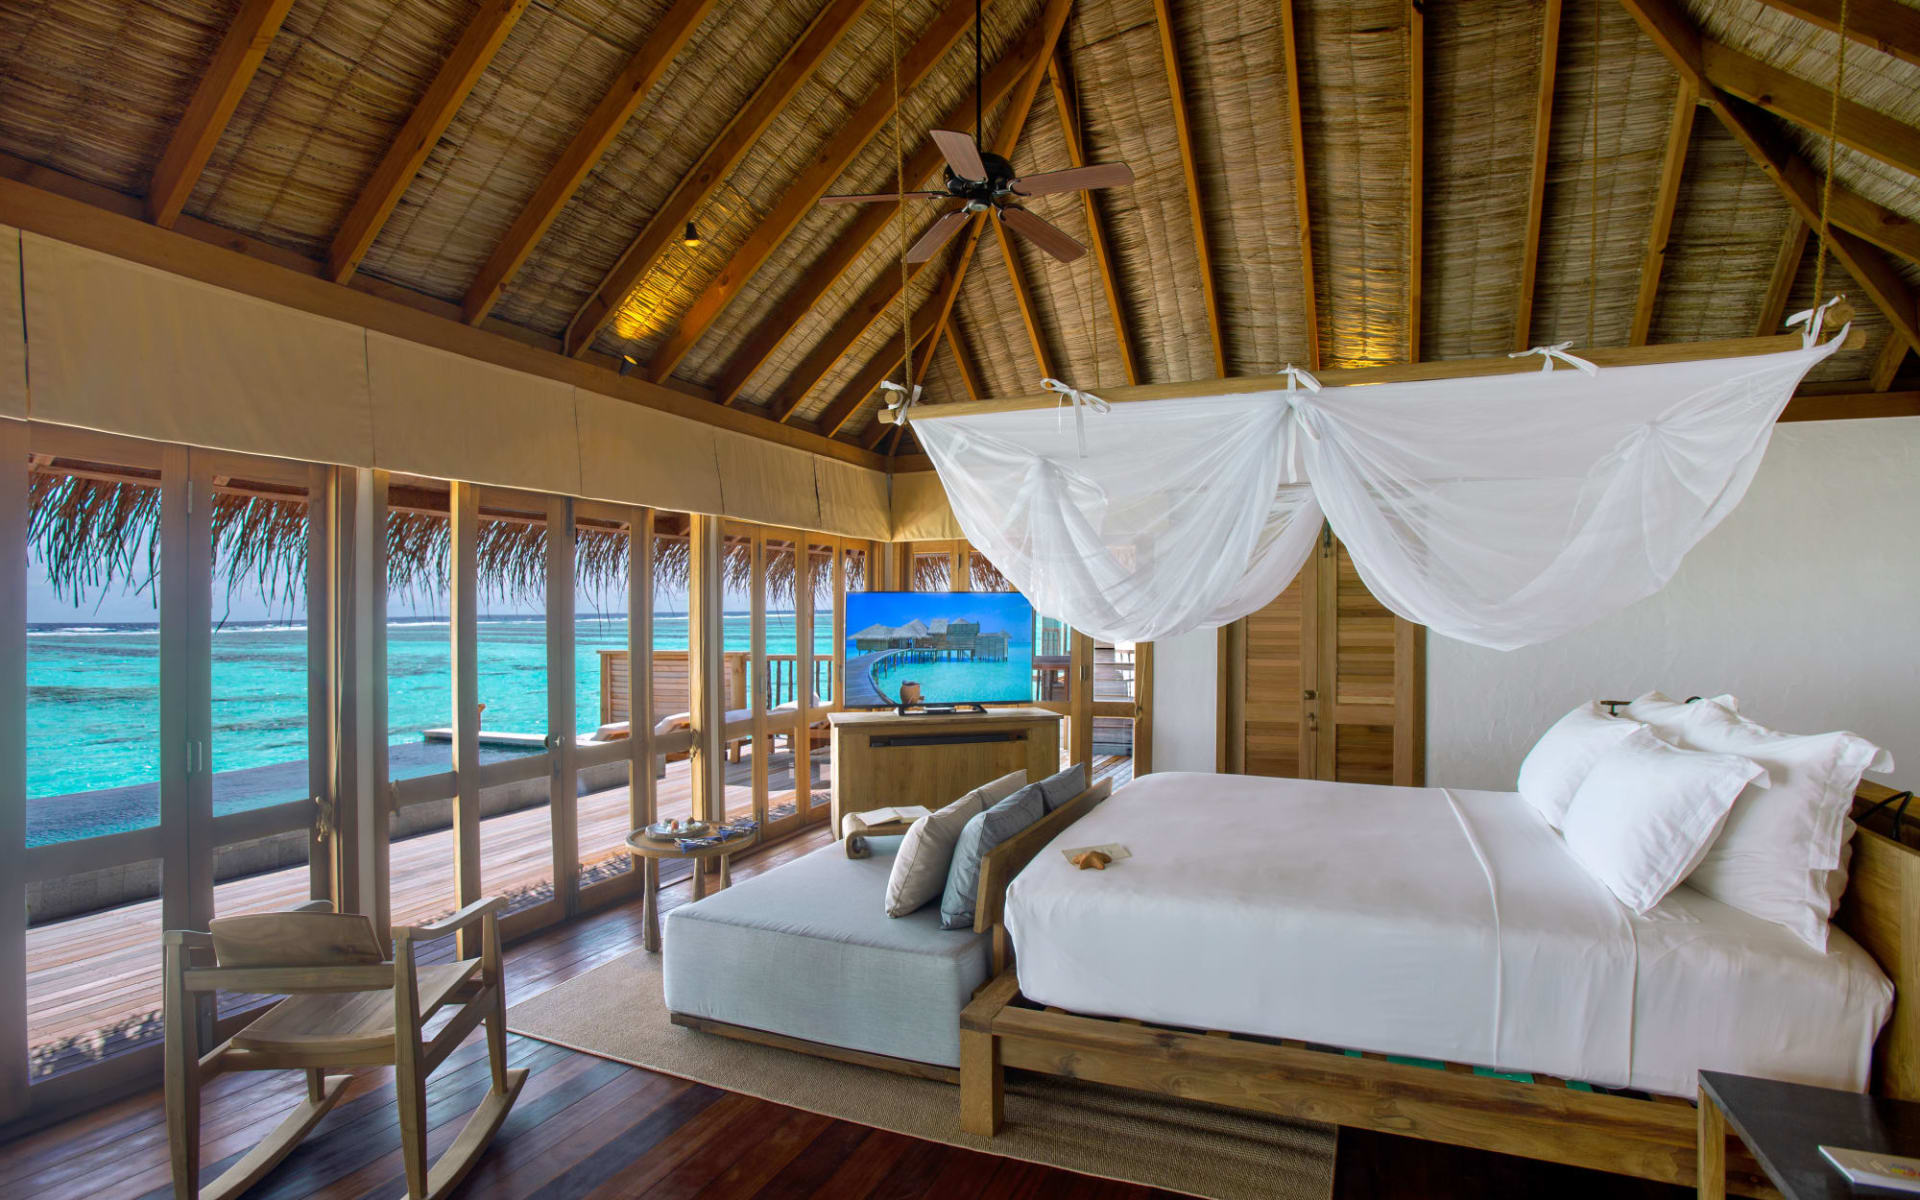 Gili Lankanfushi Maldives in Nordmale-Atoll:  Family Villa Pool